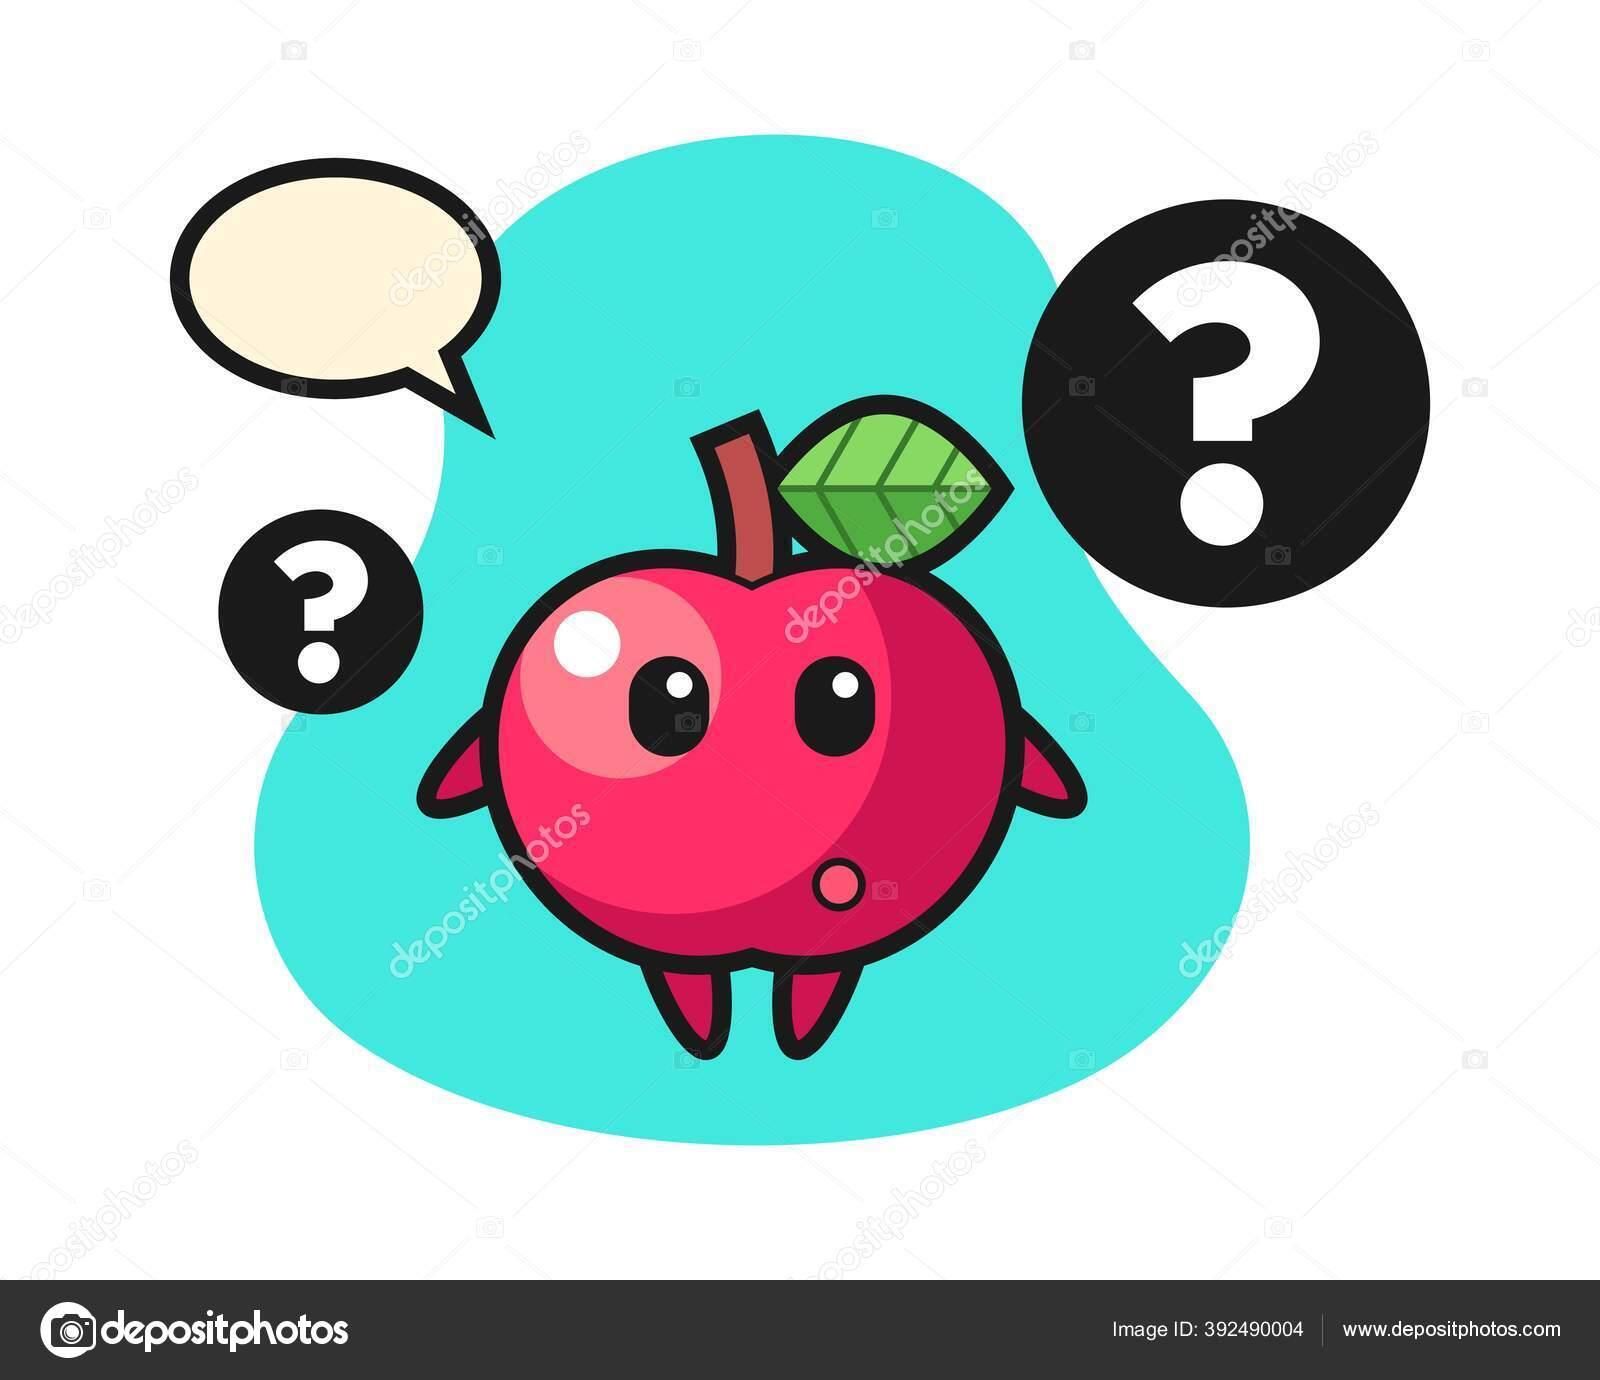 cartoon illustration apple question mark stock vector c heriyusuf rap gmail com 392490004 https depositphotos com 392490004 stock illustration cartoon illustration apple question mark html